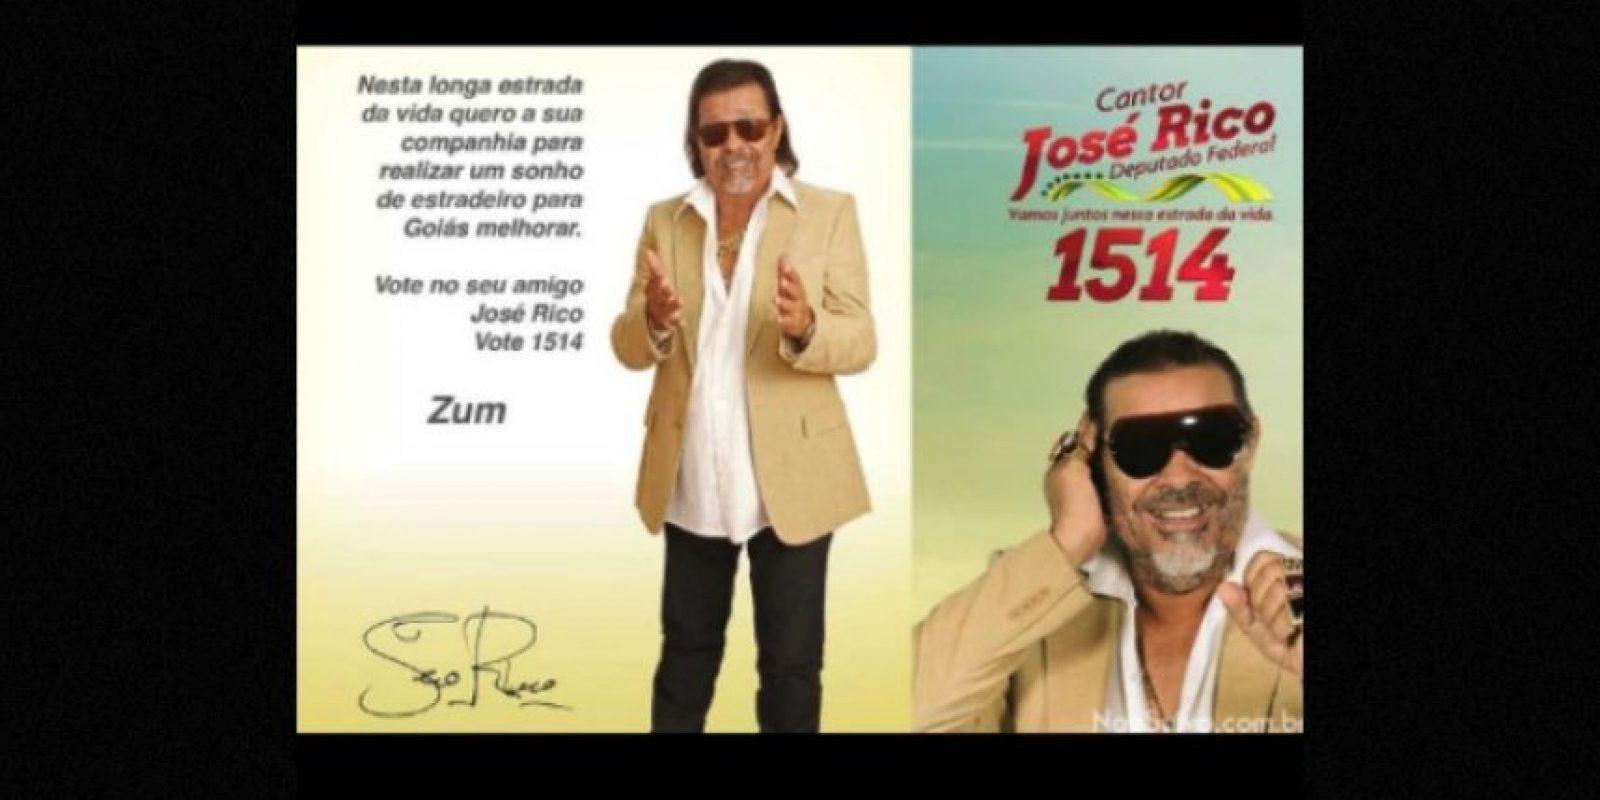 Los peculiares candidatos de Brasil Foto:Naosalvo.com.br